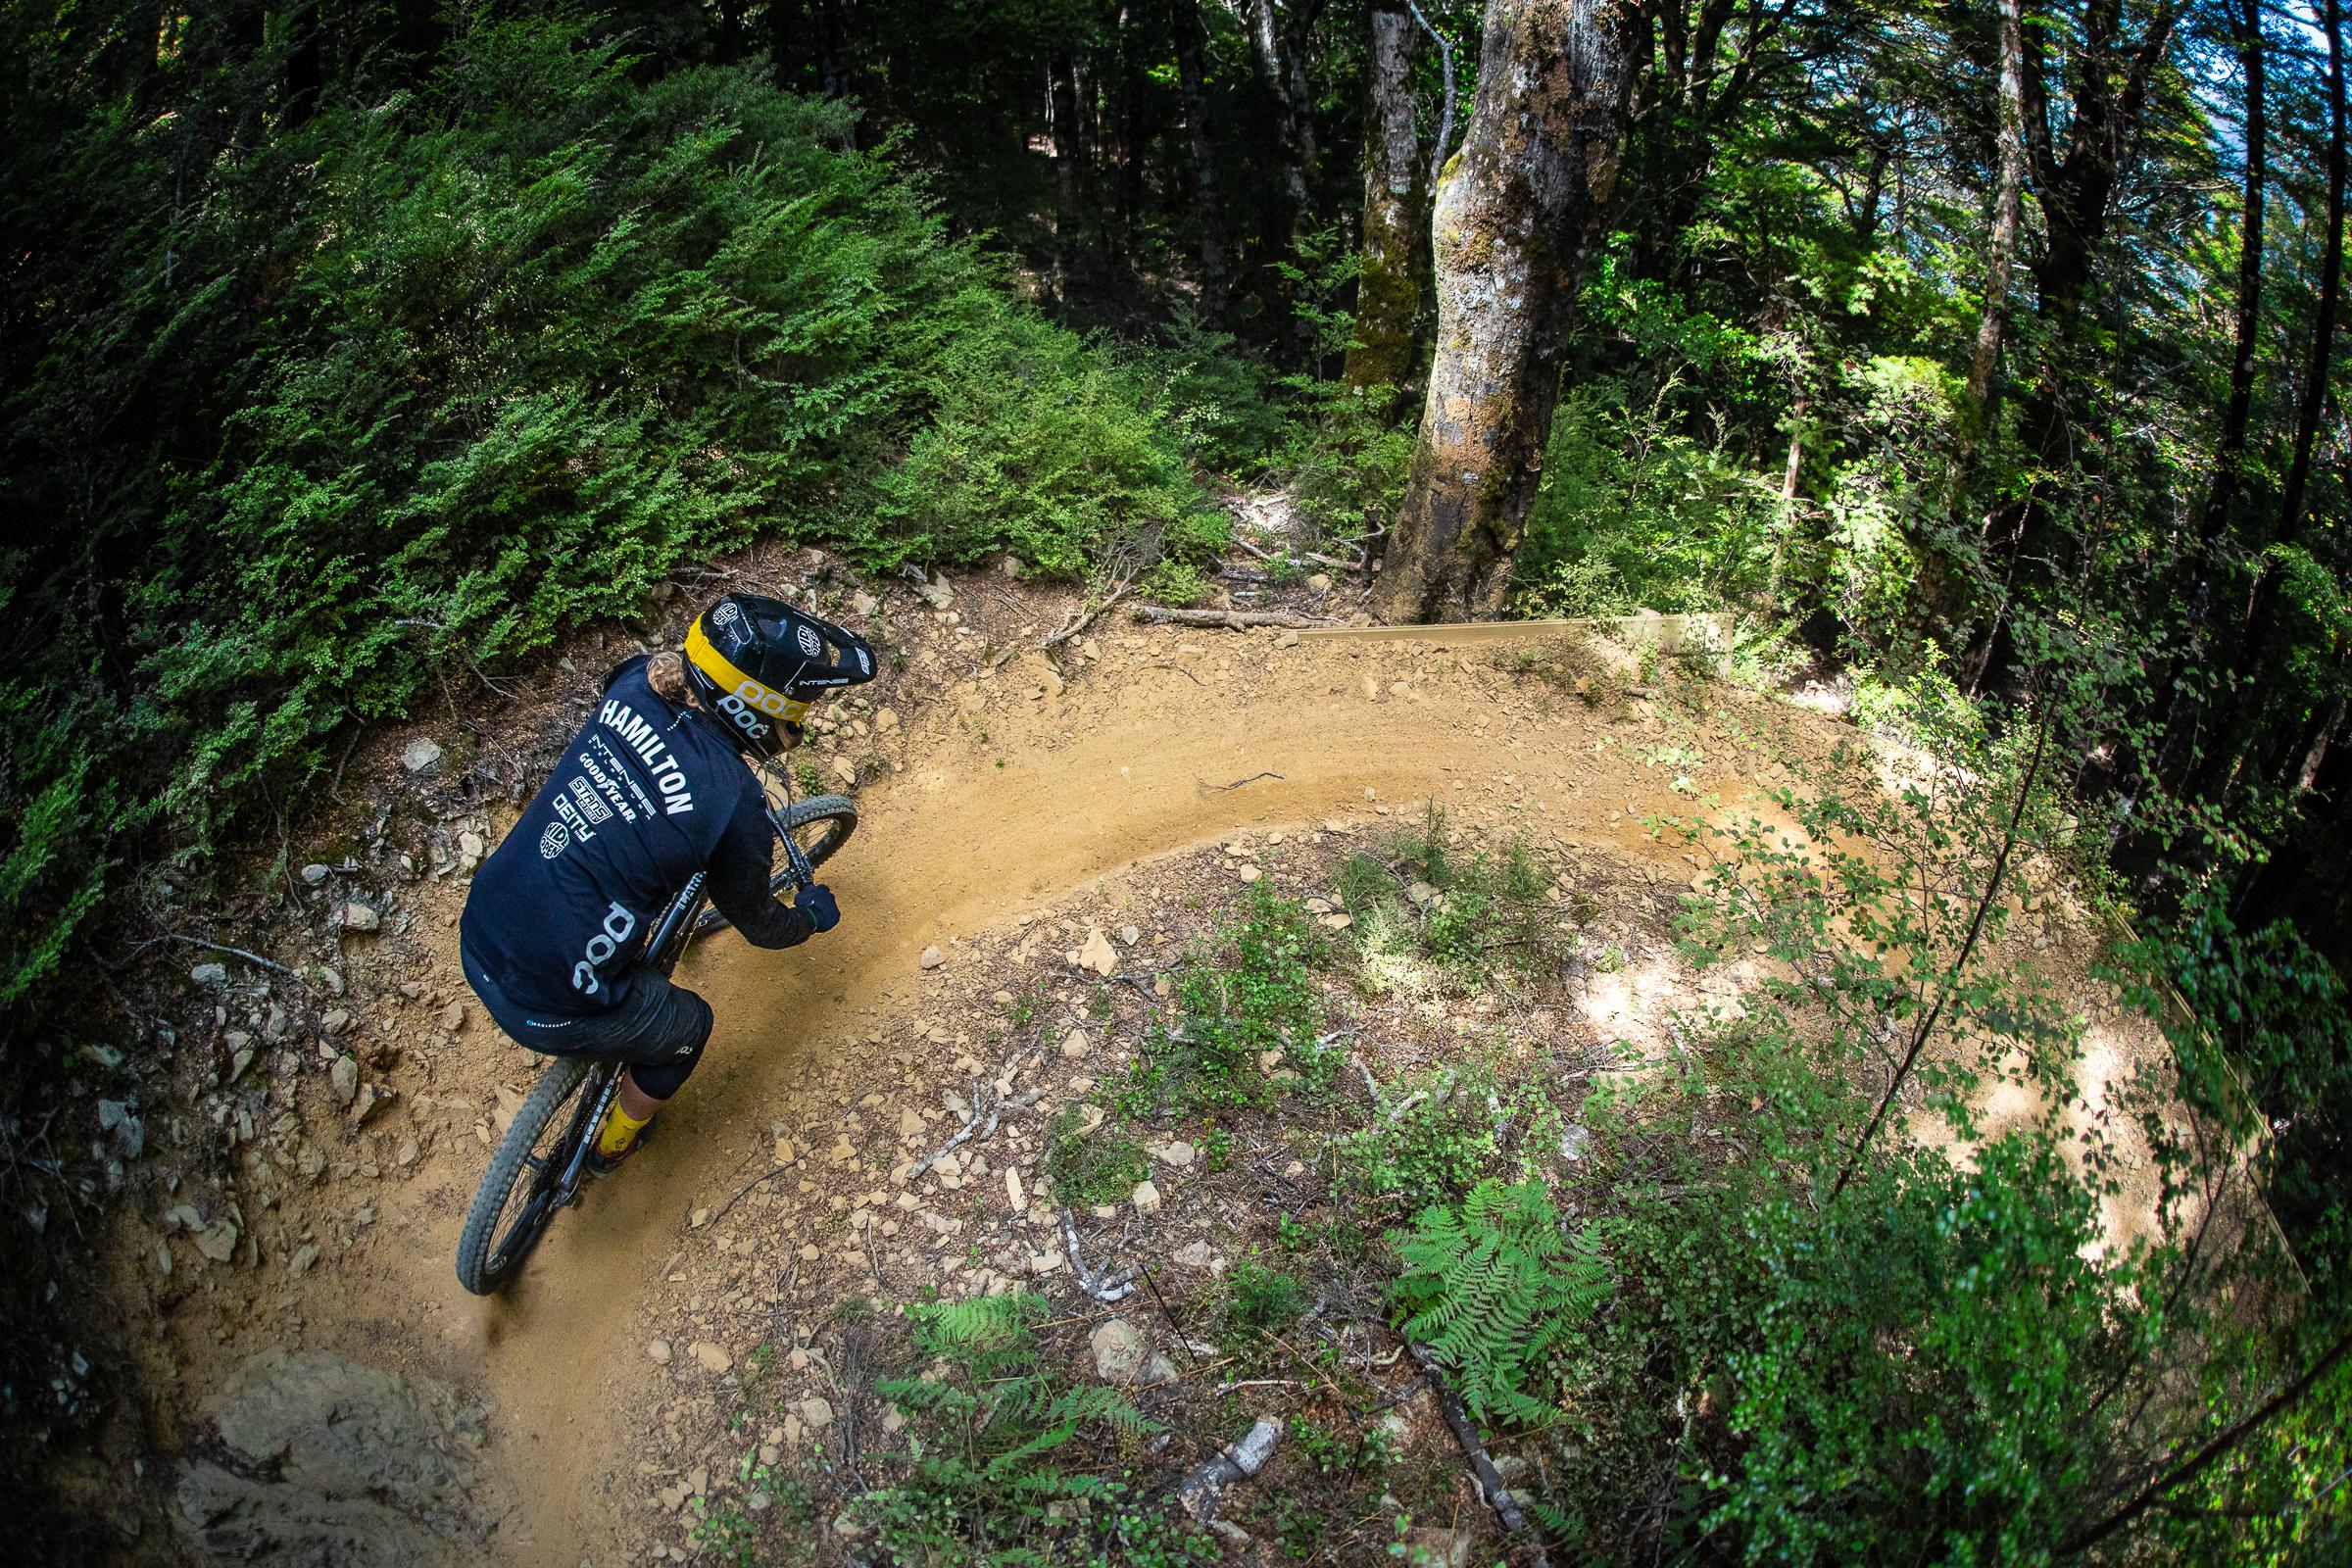 Connor Hamilton takes on a dusty turn. Photo: Matt Wood.